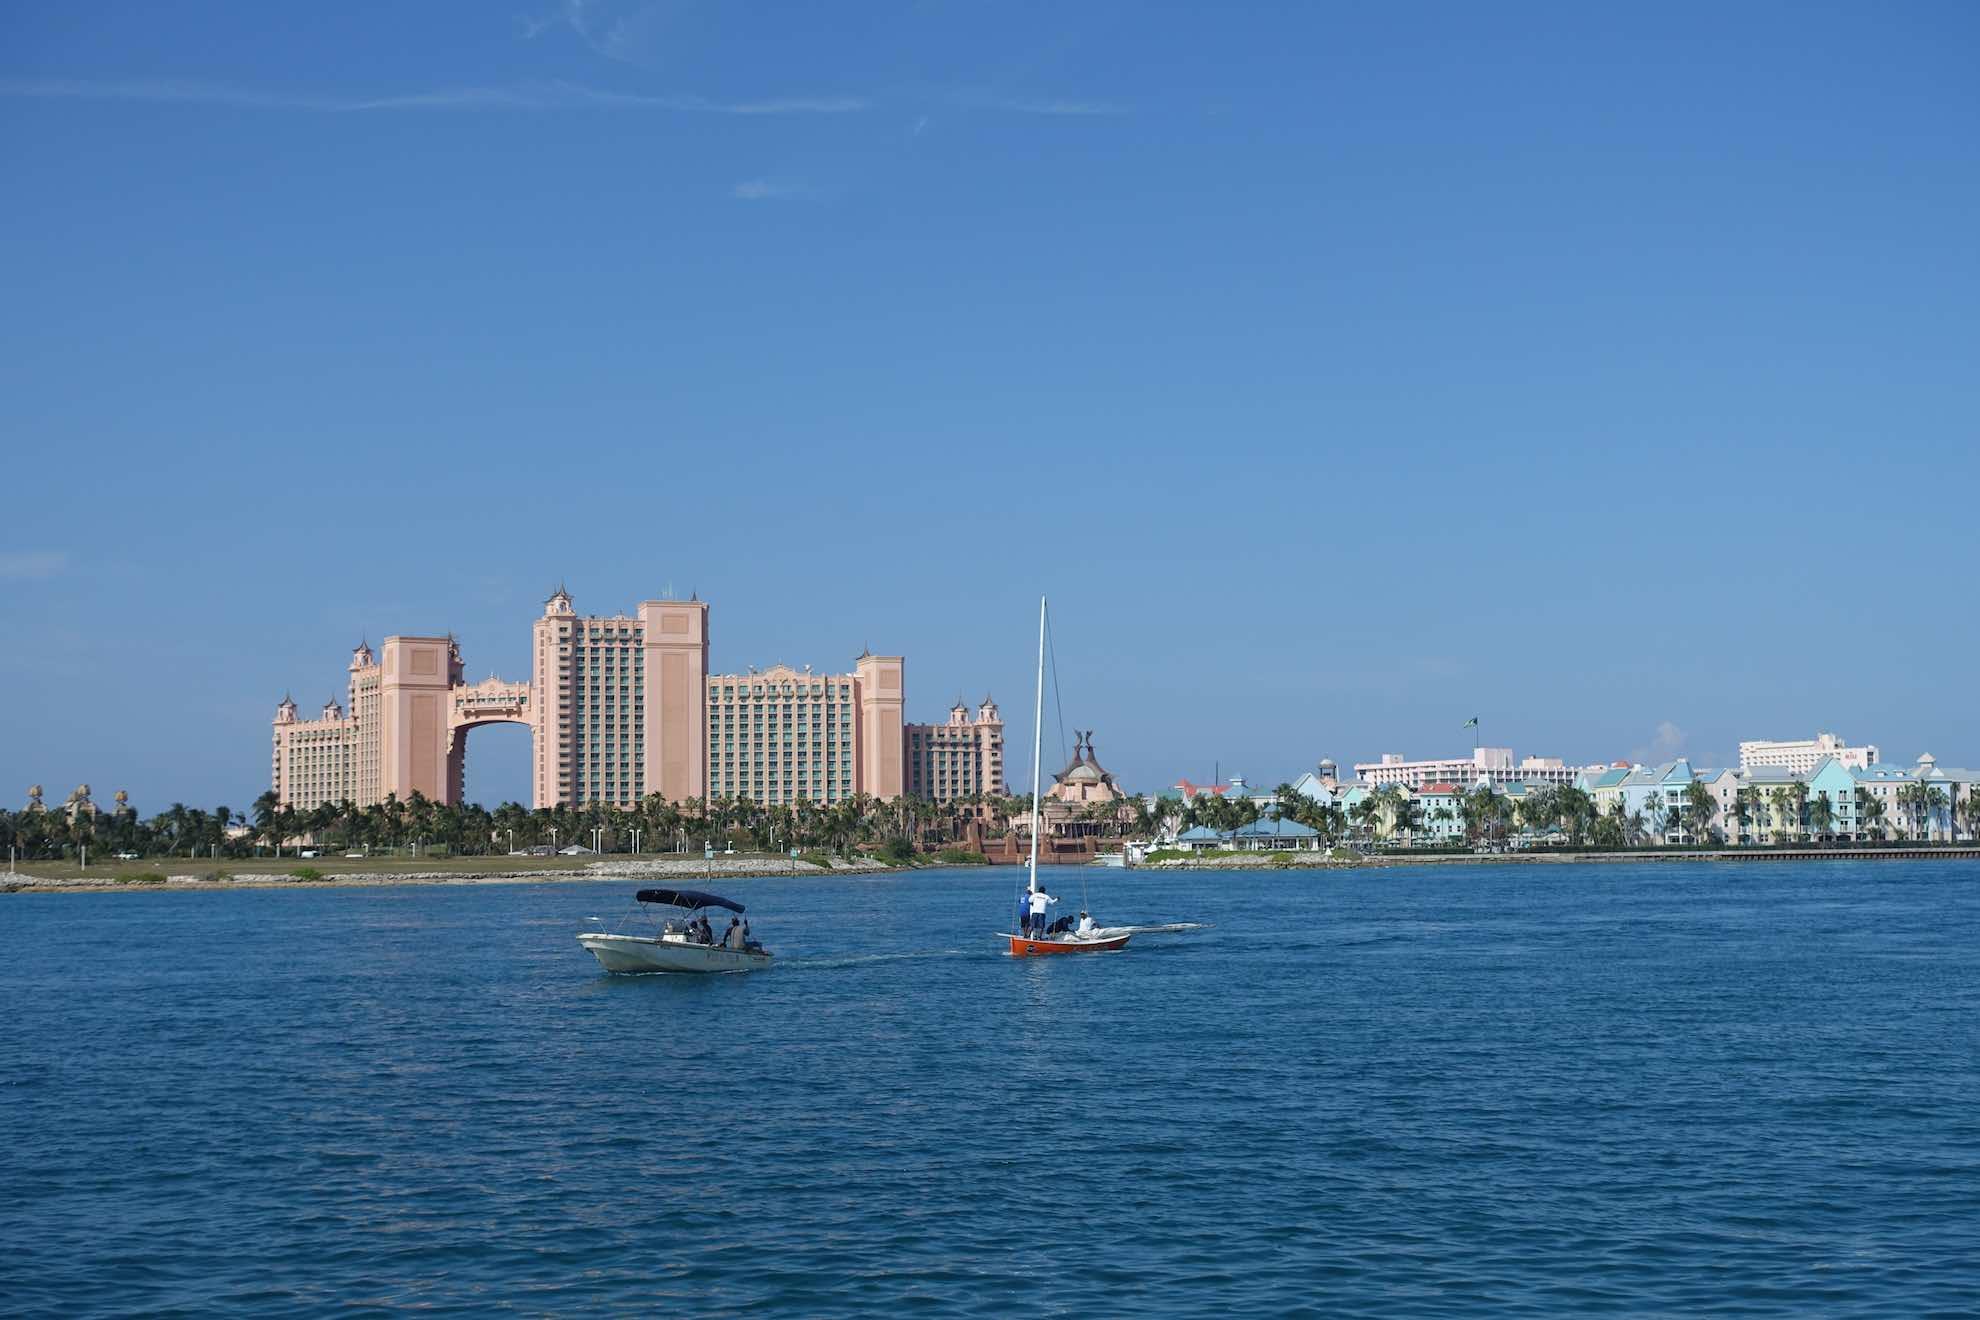 Das berühmte Hotel Atlantis ist unübersehbar.